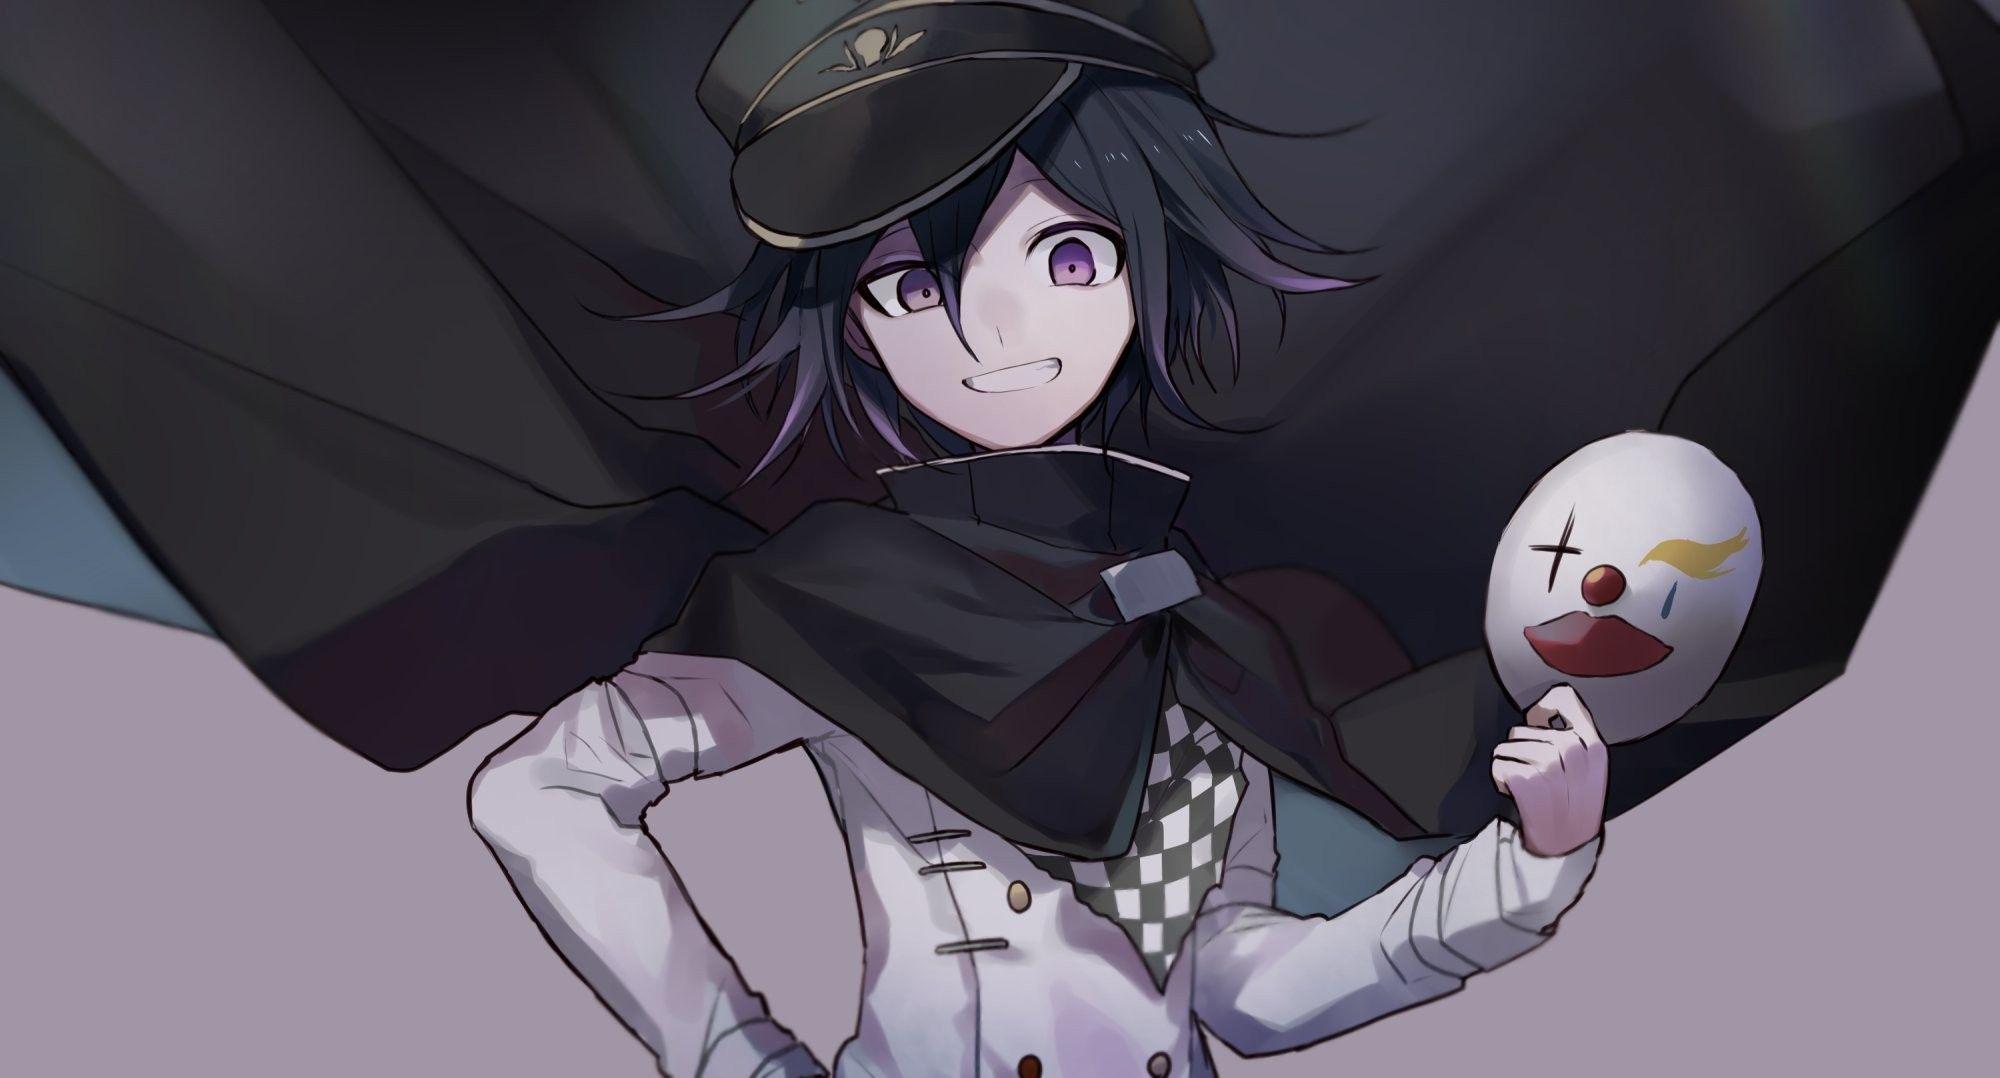 Kokichi Ouma By Fuyu Koke Danganronpa Danganronpa Characters Anime